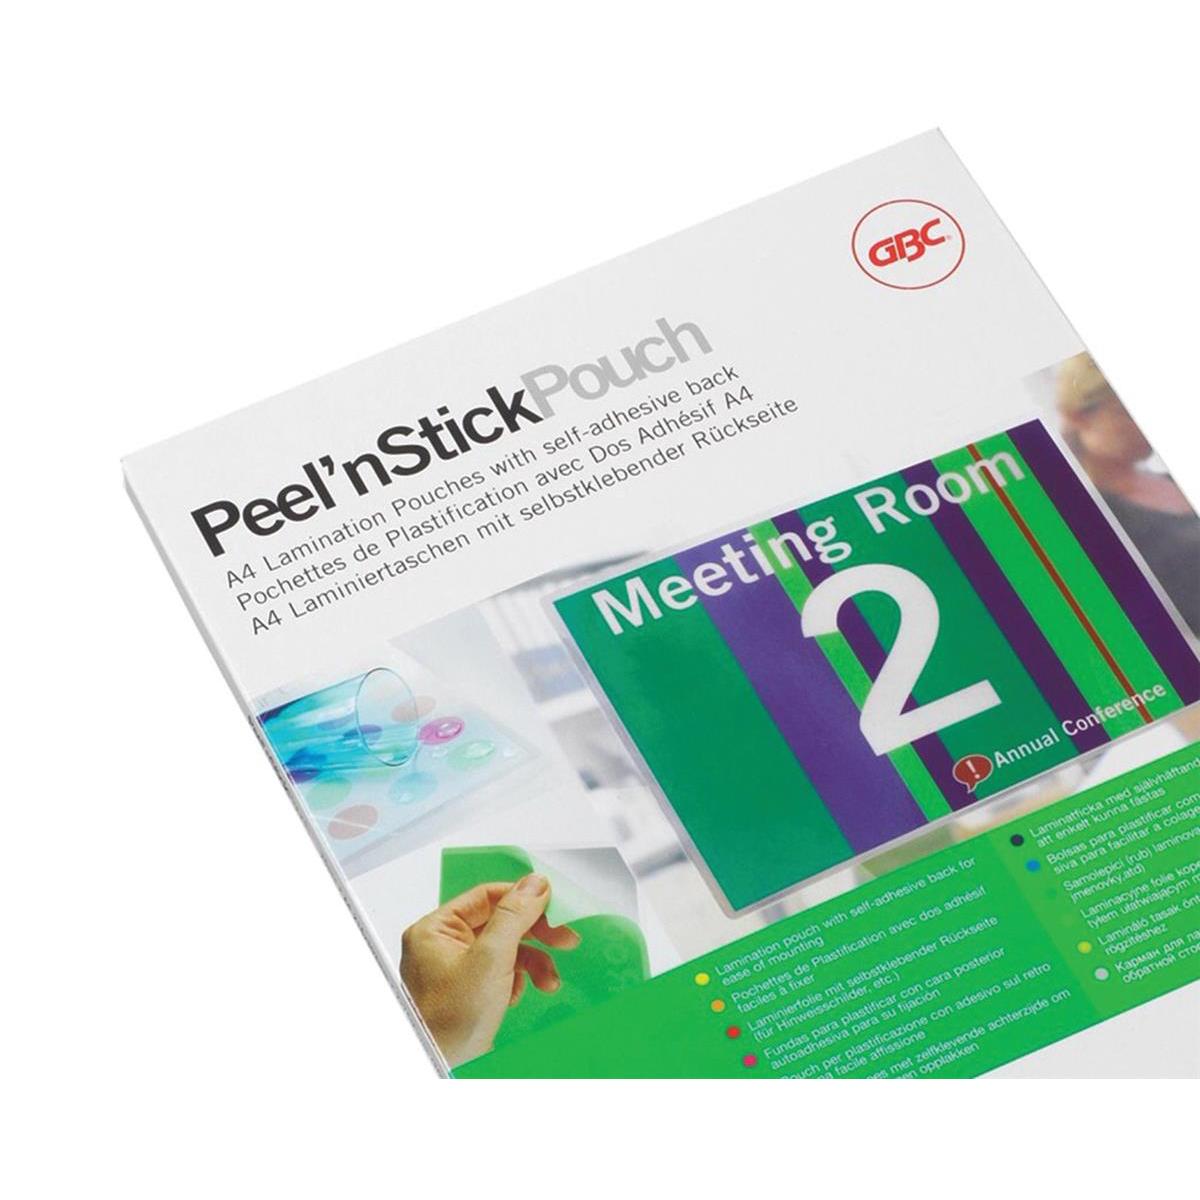 GBC Peel nStick Laminating Pouches Gloss 200 Micron A4 Ref 41666E [Pack 100]